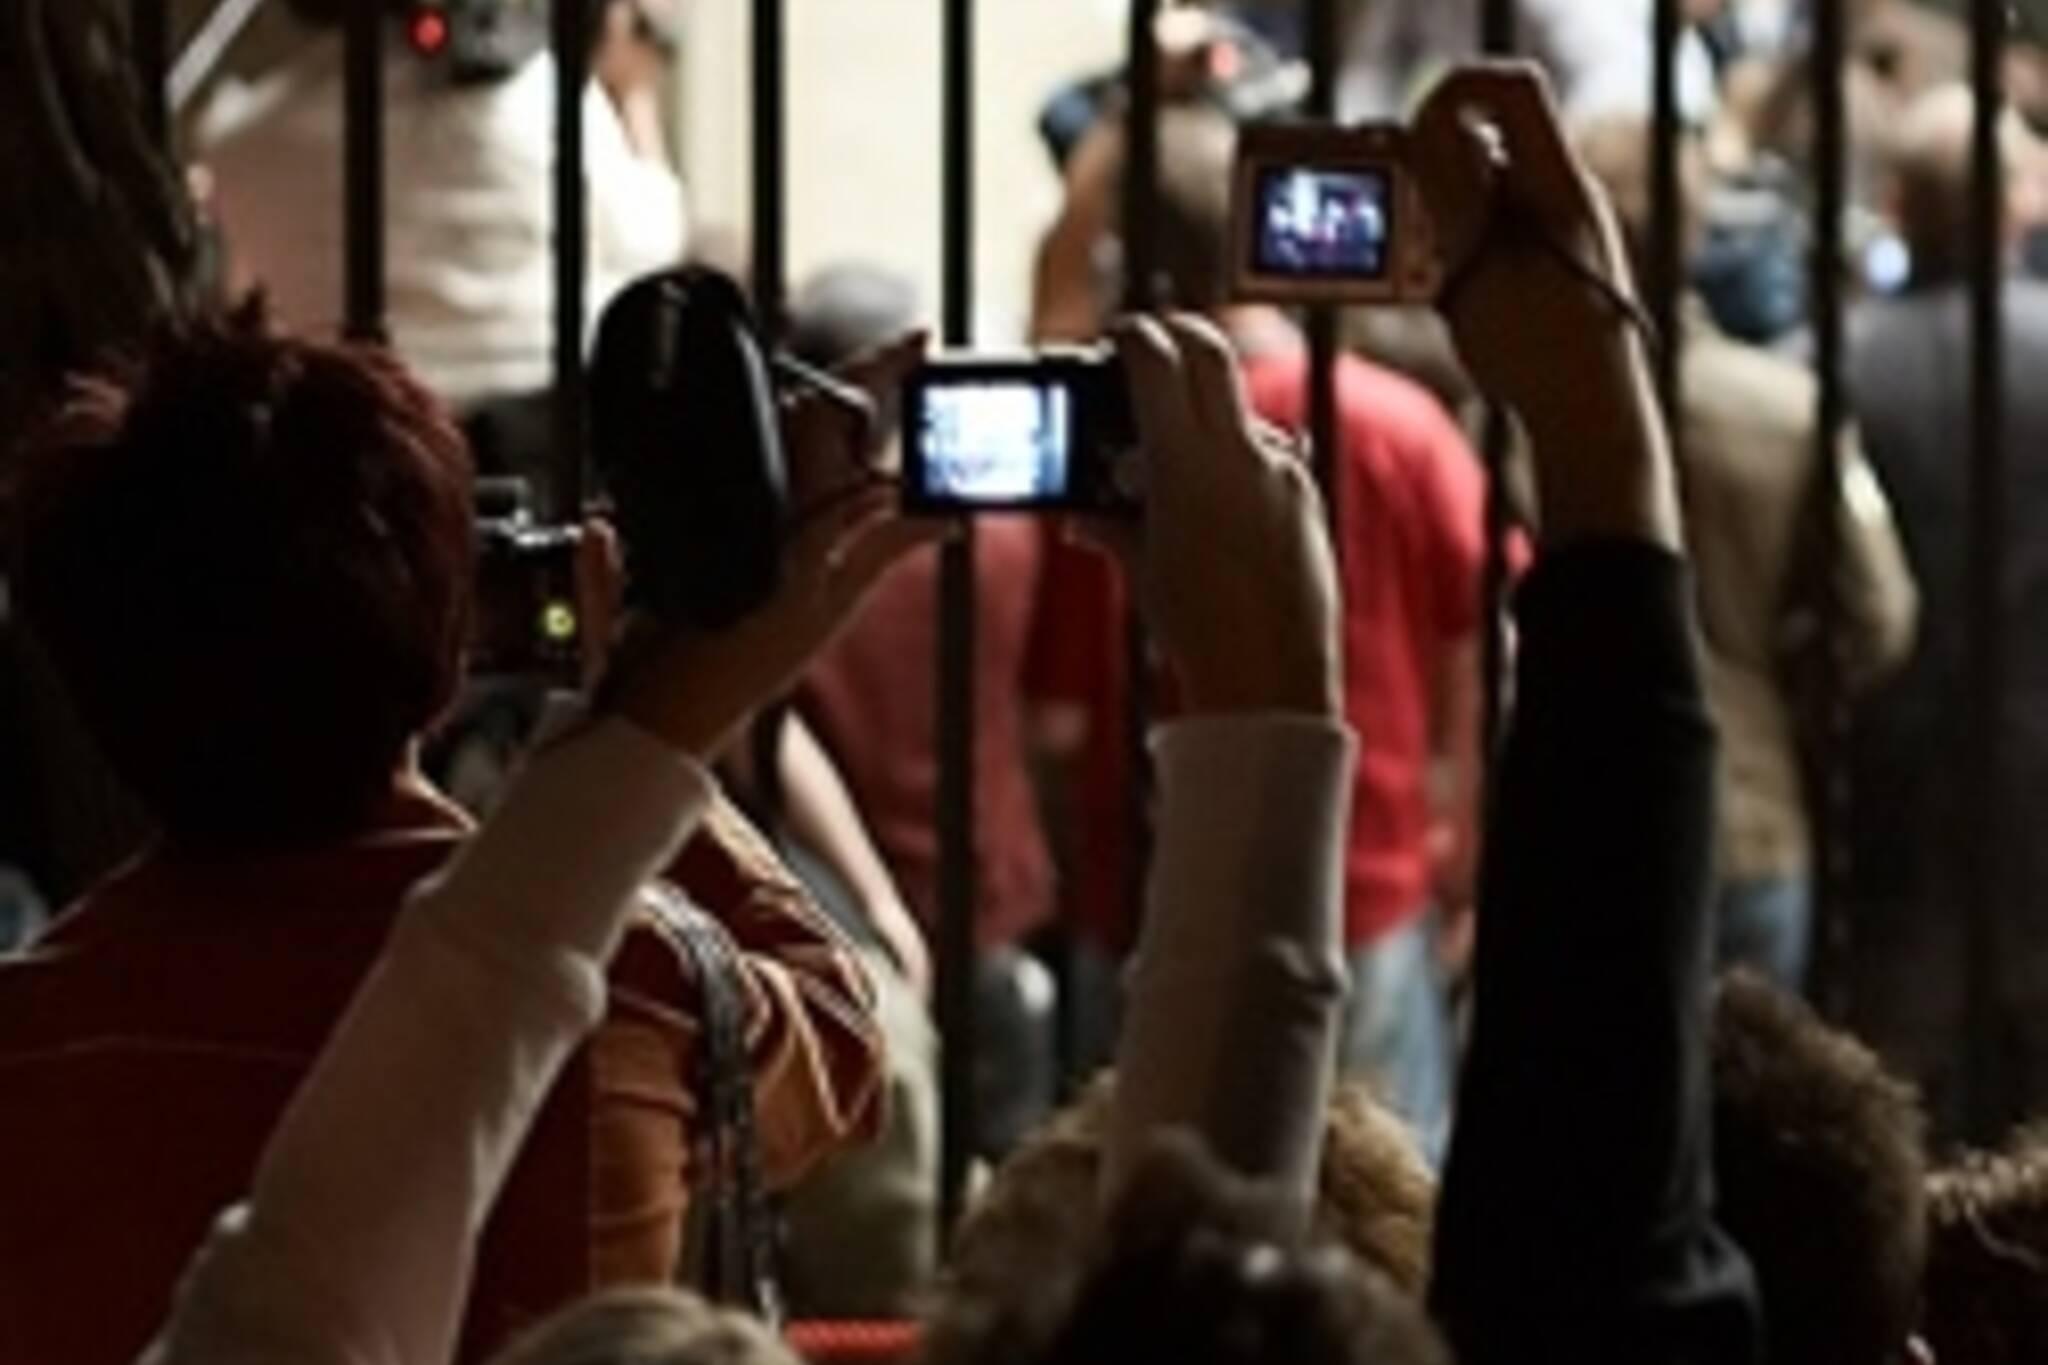 Crowds at TIFF 2006